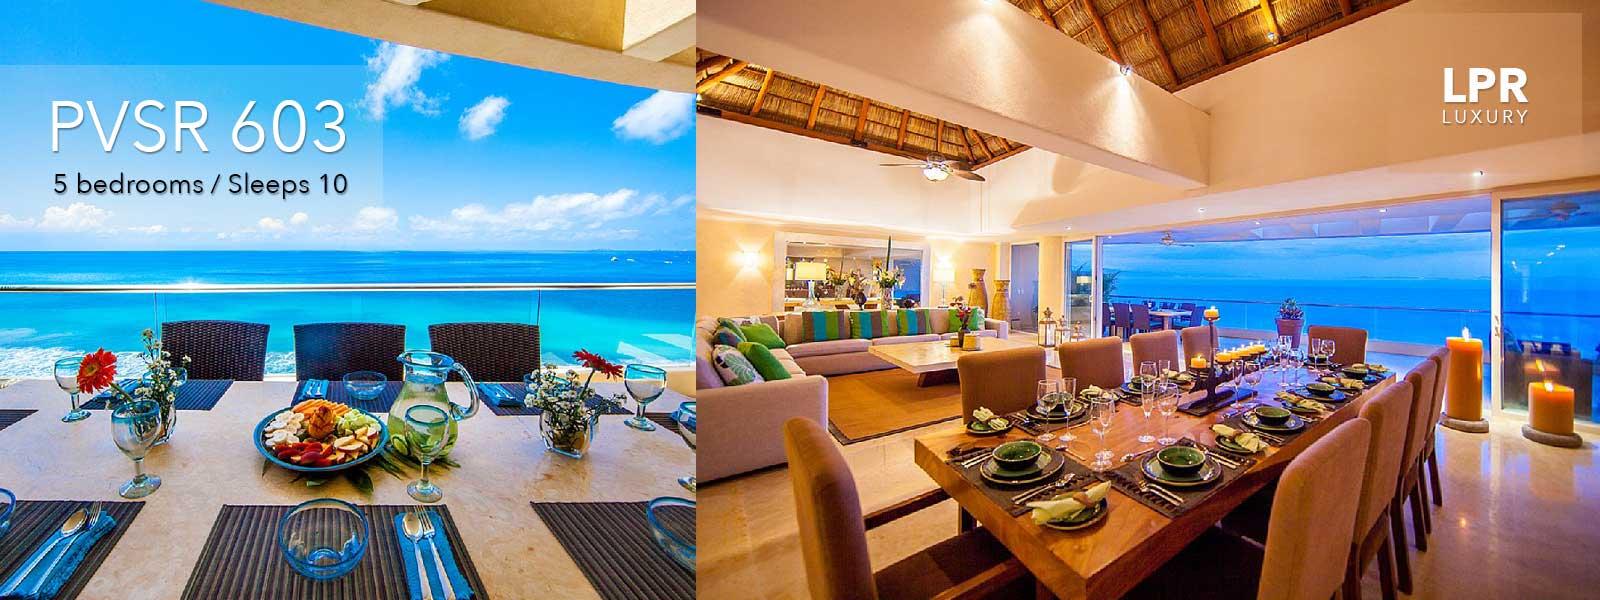 PVSR Penthouse 603 - Punta Vista Signature Residences - Playa Punta de Mita, Riviera Nayarit, Mexico